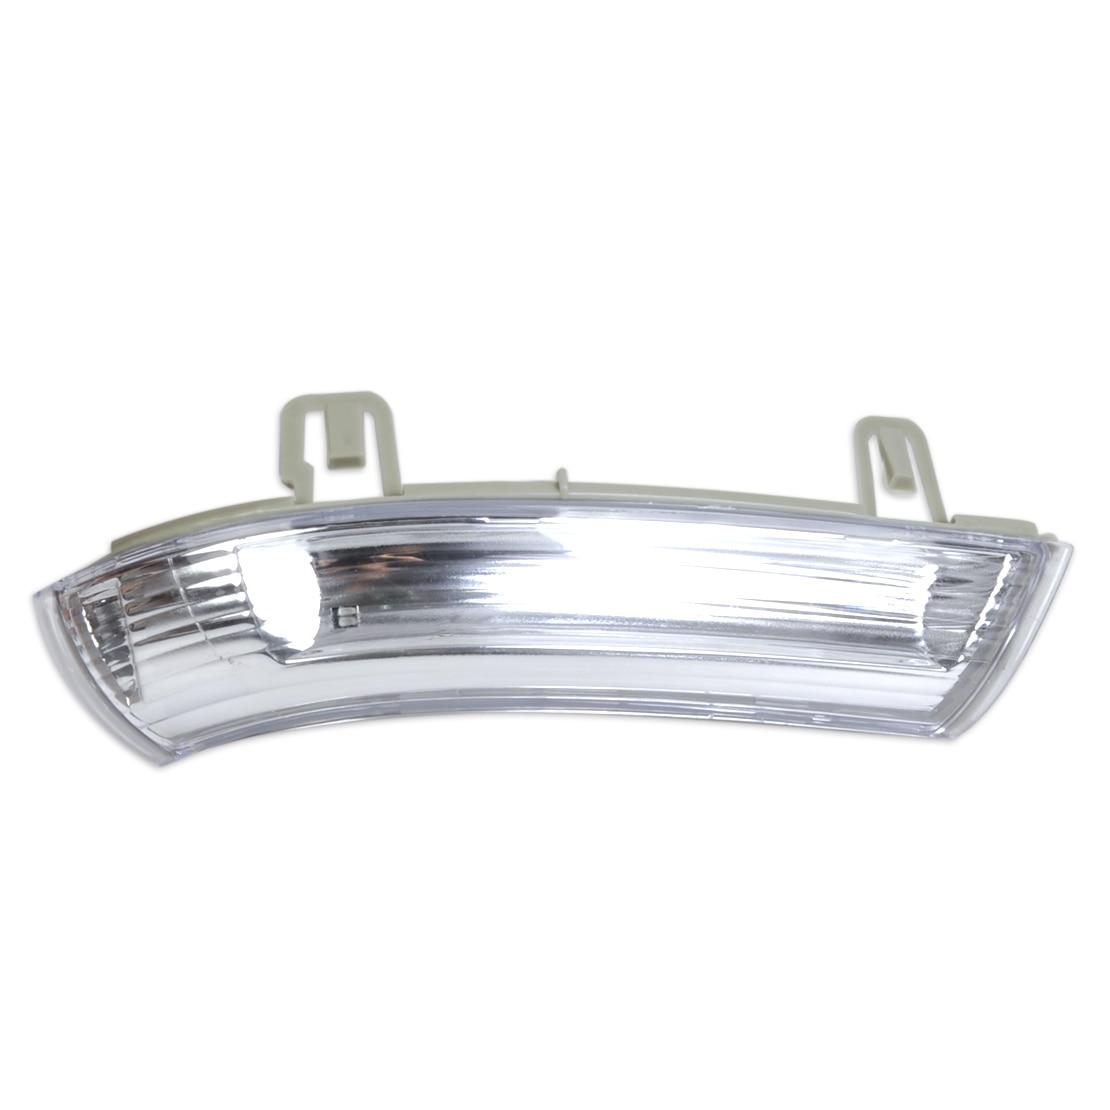 beler 1K0949102 1K0 949 102 Right Side Wing Mirror Indicator Lamp Turn Signal Light for VW Golf GTI Jetta MK5 Passat Rabbit EOS wing mirror glass indicator for vw golf 5